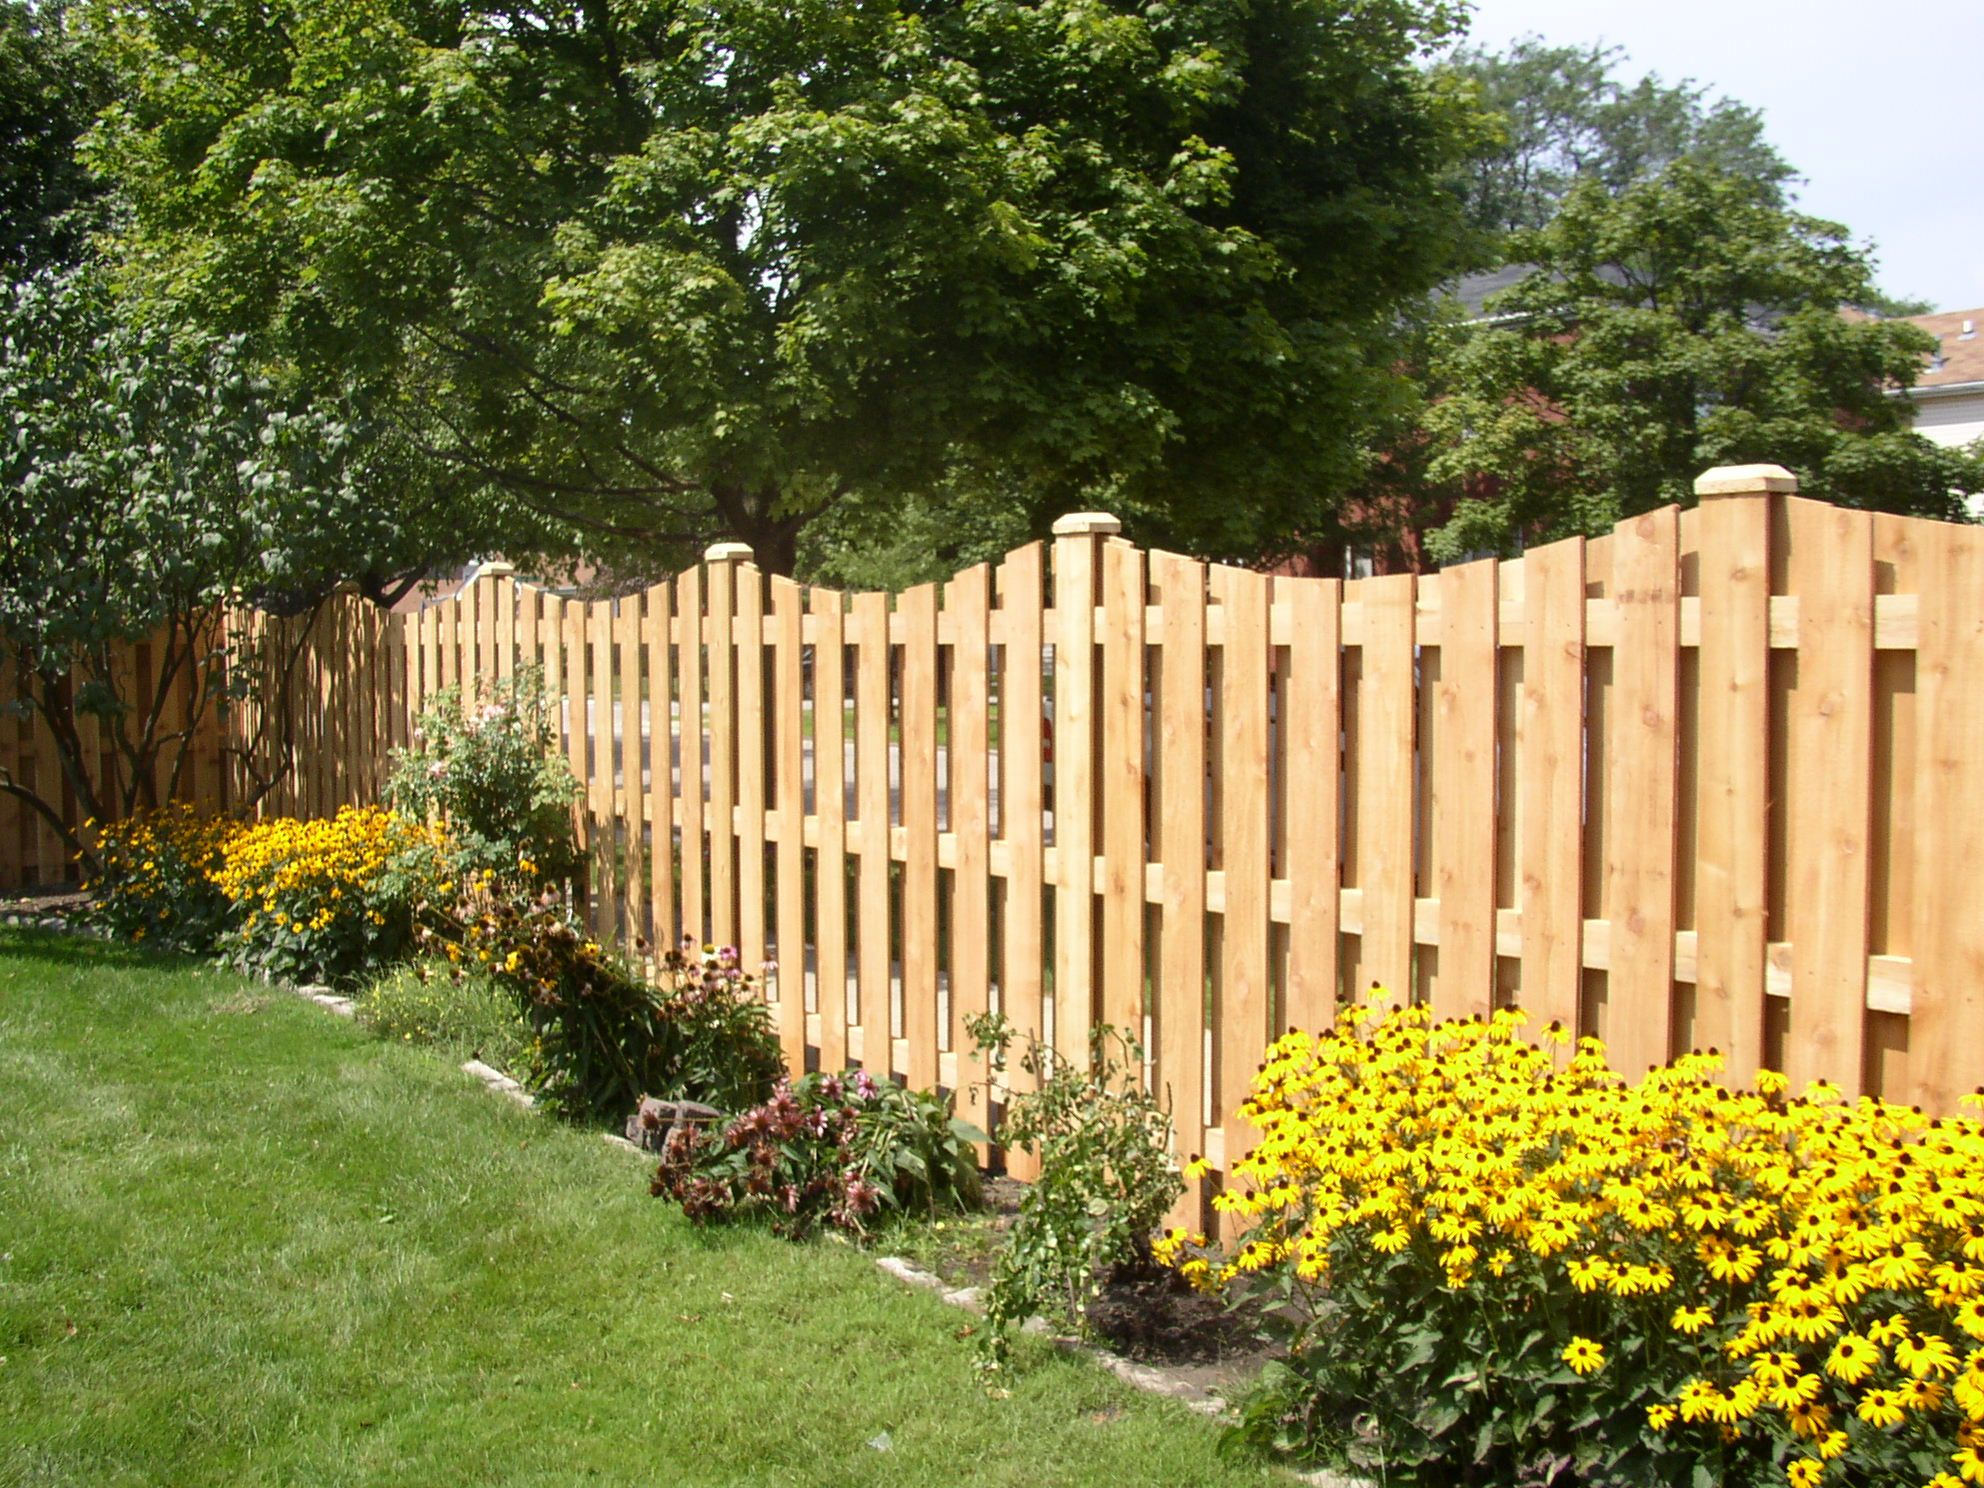 Scalloped Cedar Privacy Fence